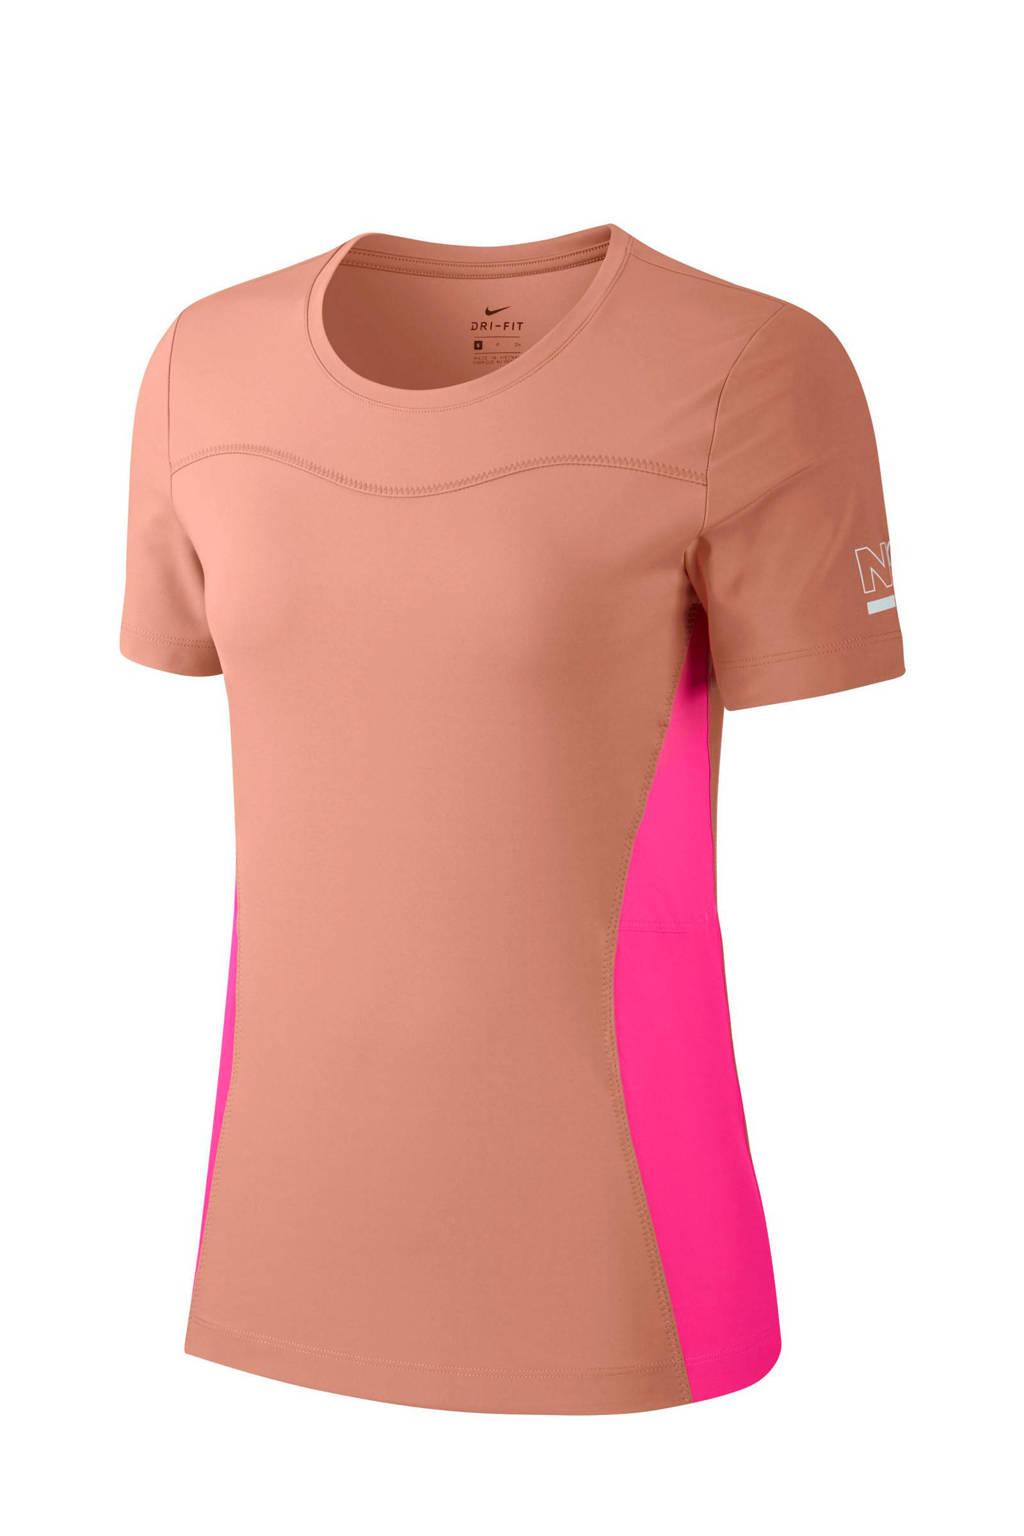 Nike sport T-shirt oudroze, Oudroze